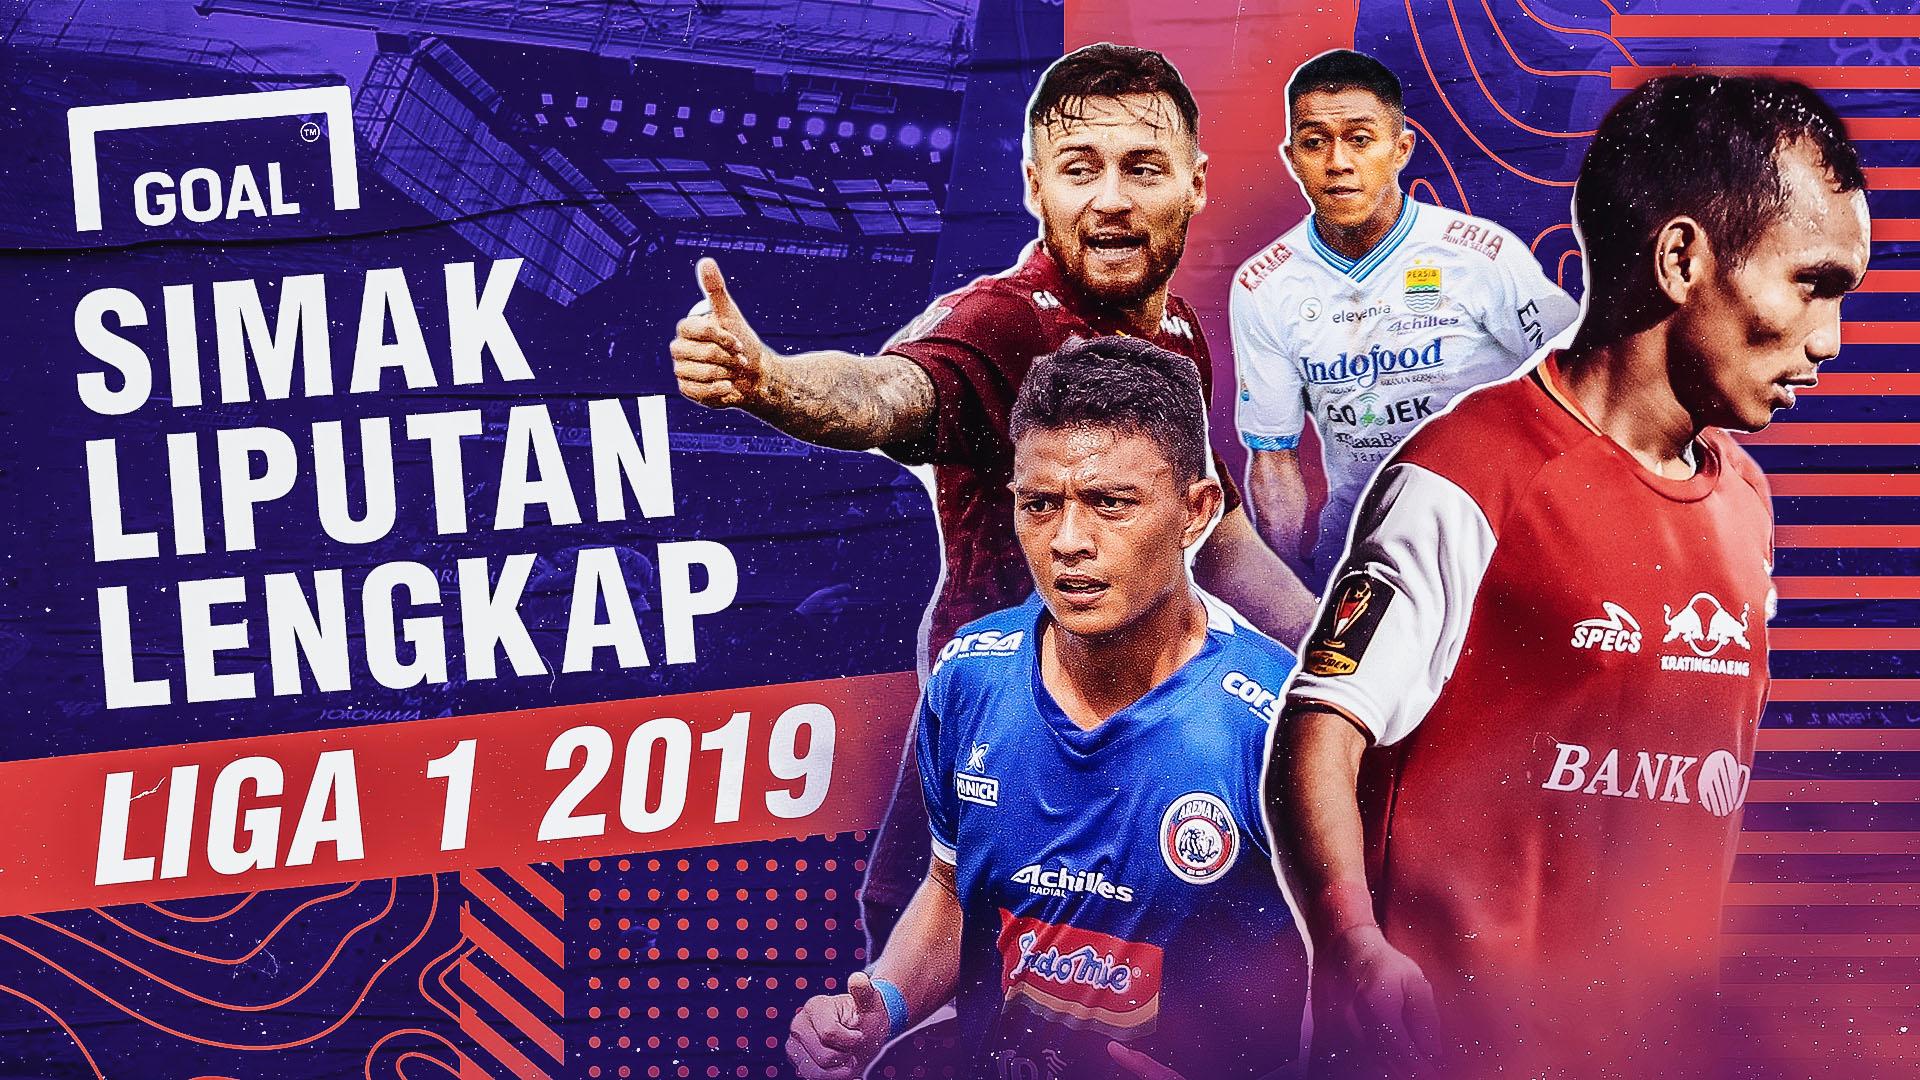 Liga 1 2019 - Footer Banner